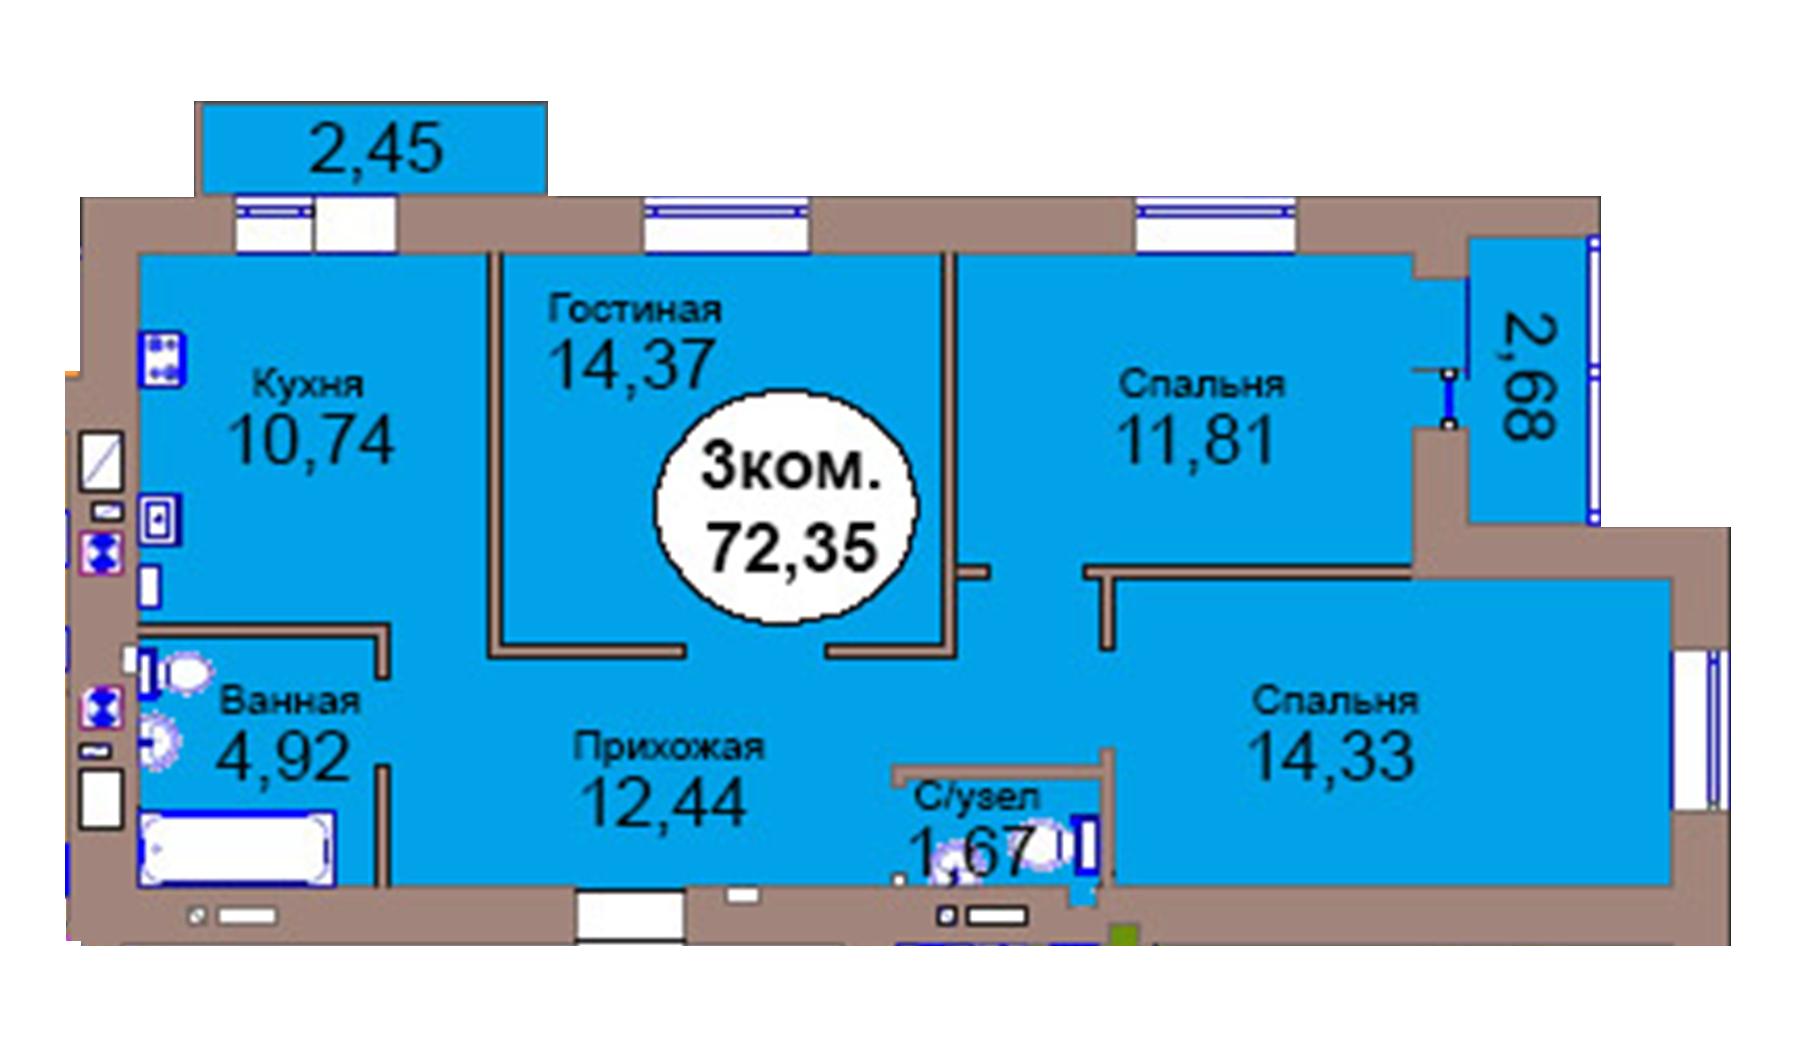 3-комн. кв. по пер. Калининградский, 4 кв. 446 в Калининграде